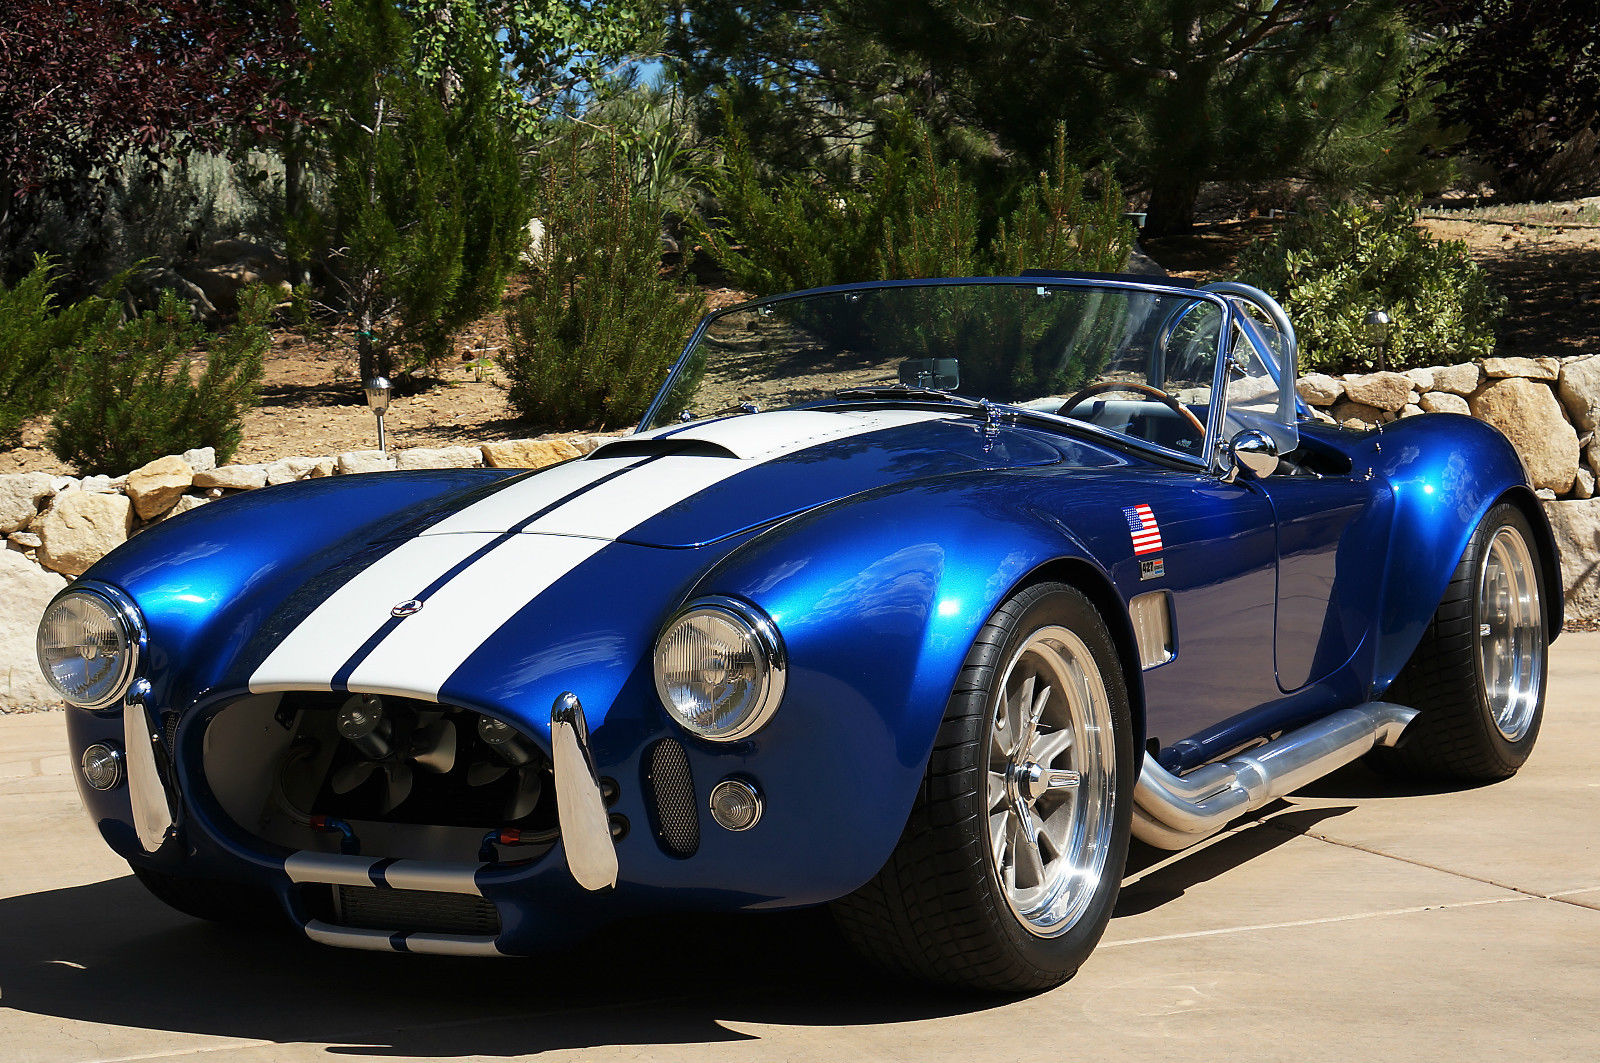 Type Of Car Oil >> ERA 1965 Shelby Cobra Replica - ERA#430 - Blue w/ White Stripes - Classic Shelby ERA Shelby ...